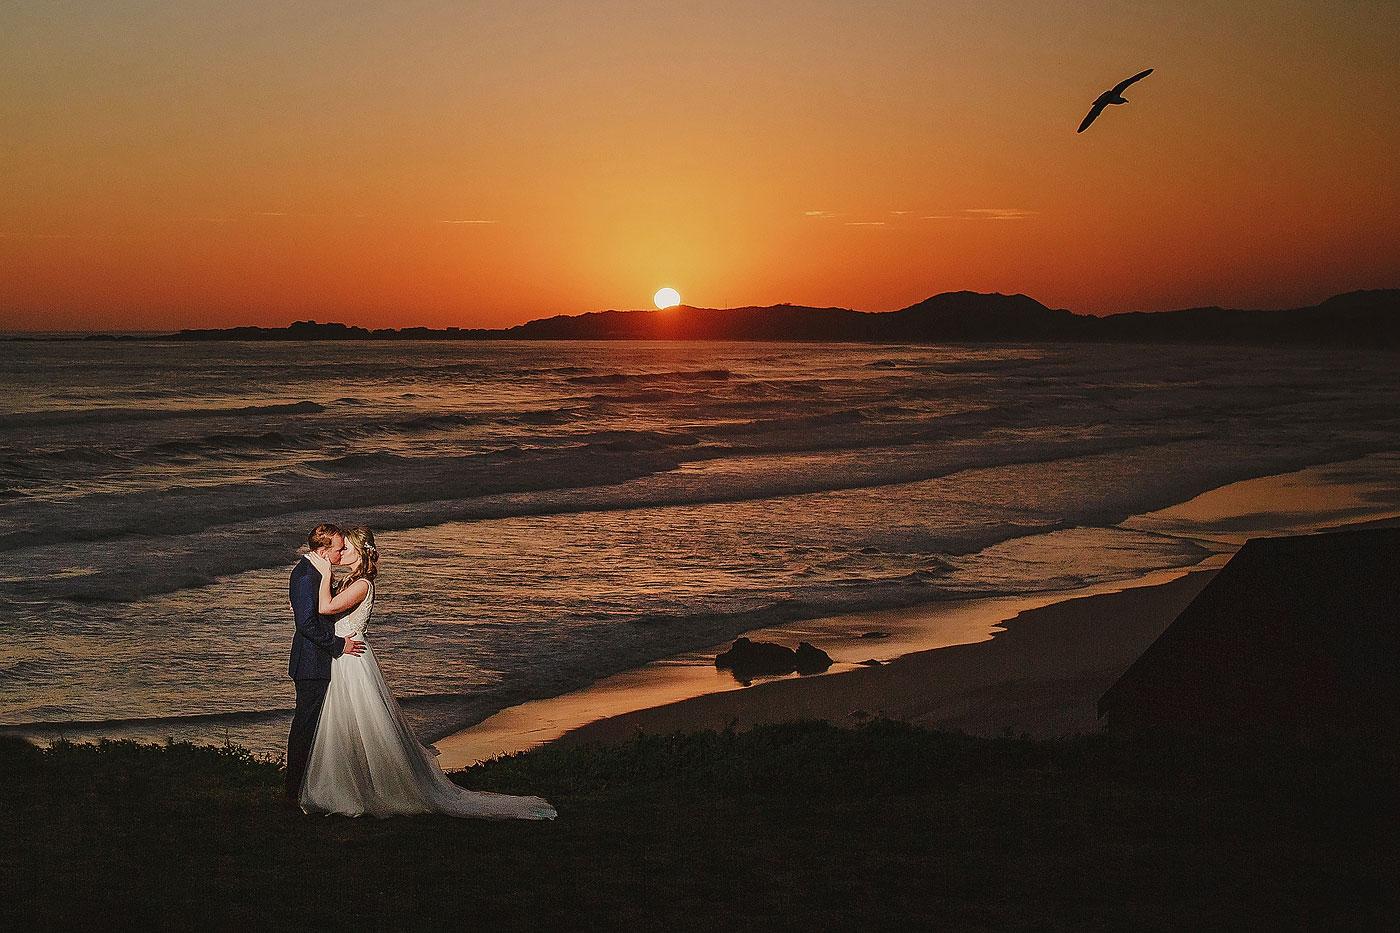 Sunset Wedding Couple Photograph